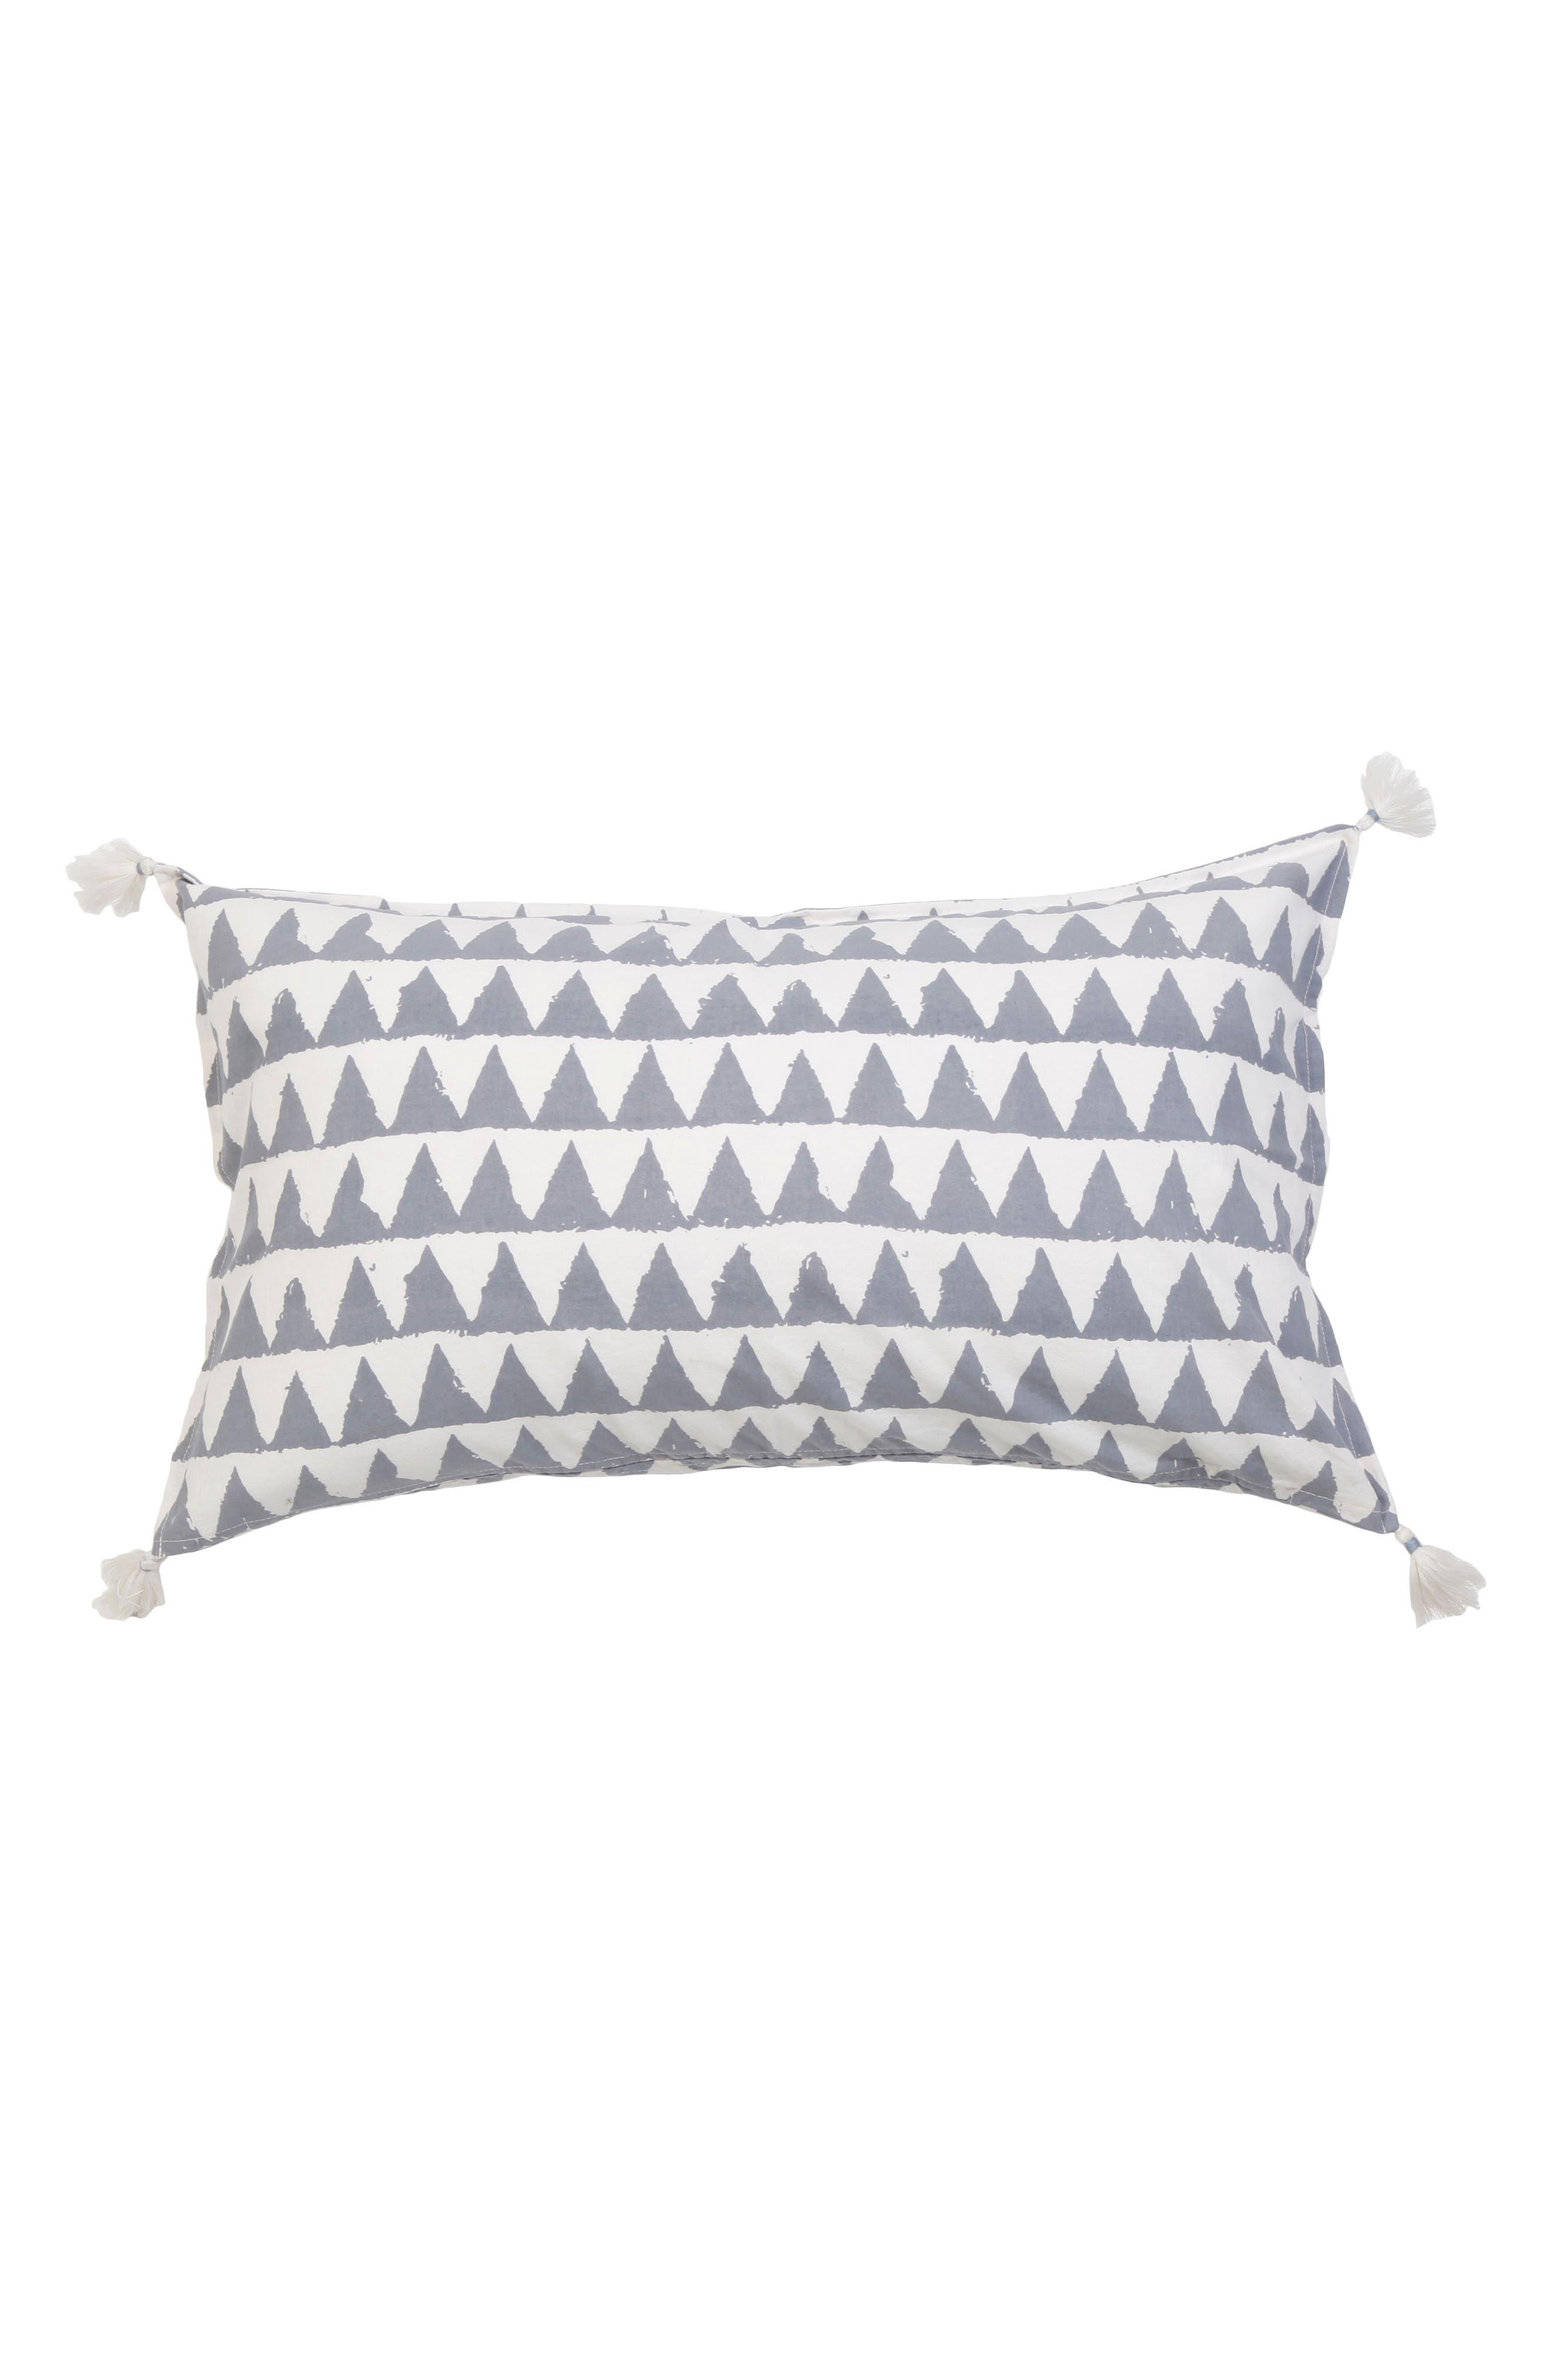 Summit Accent Pillow,                             Main thumbnail 1, color,                             Blue Multi